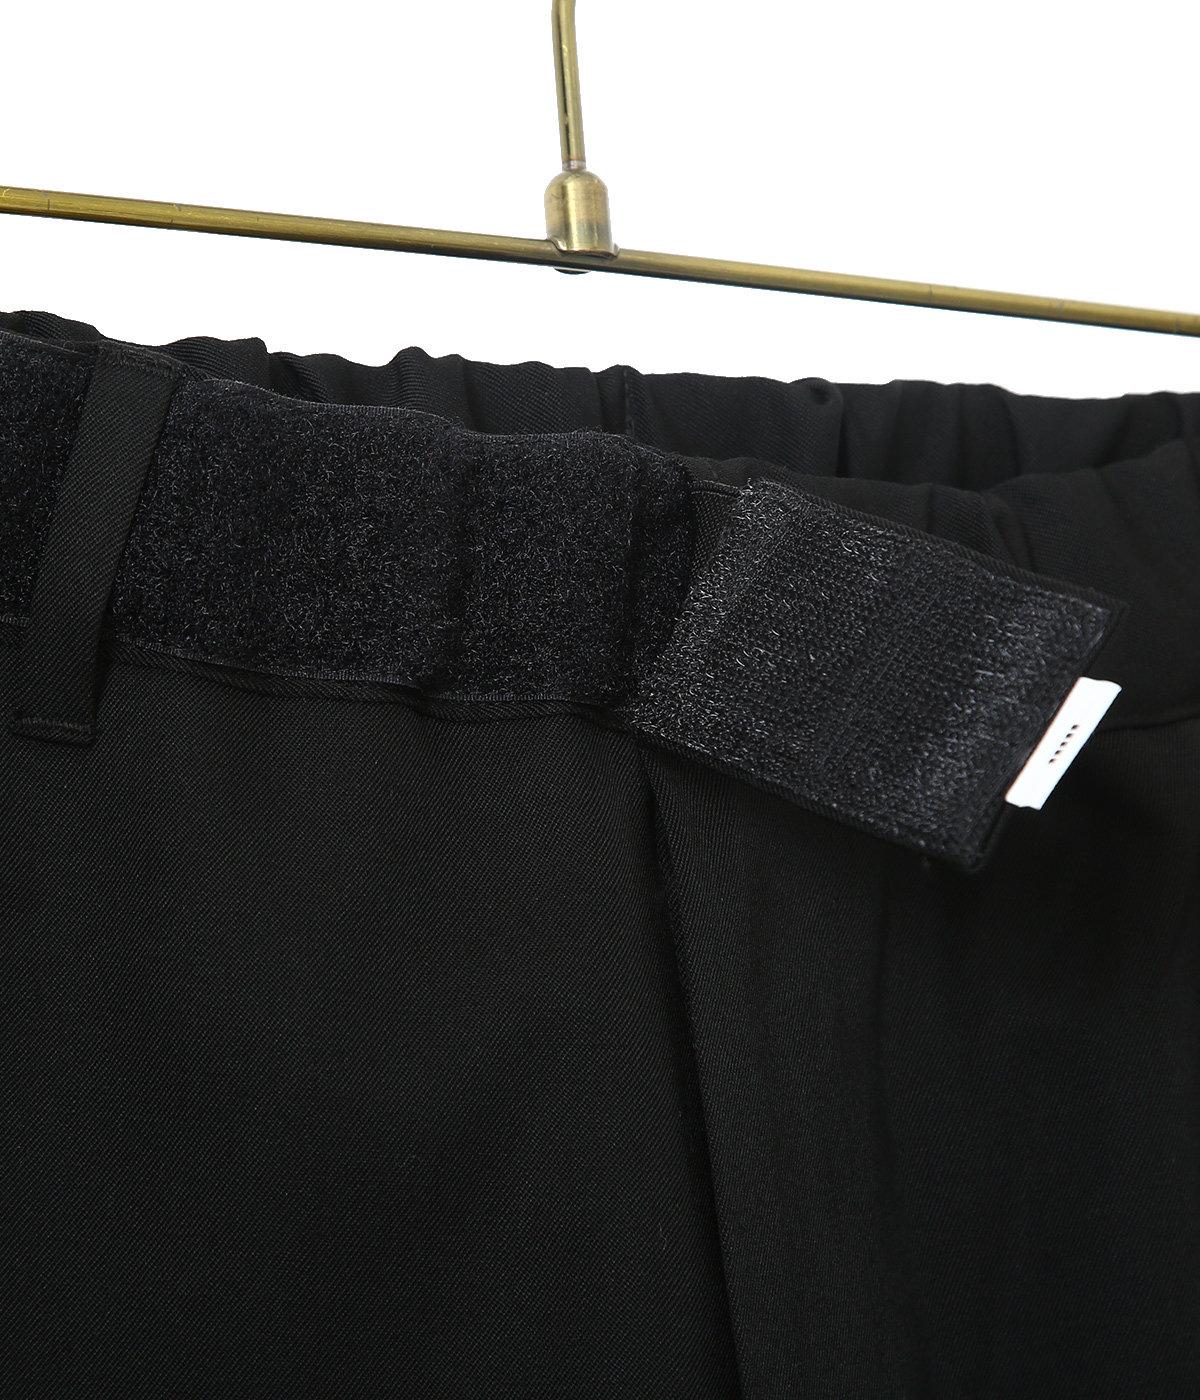 Selvage Wool Cook Pants